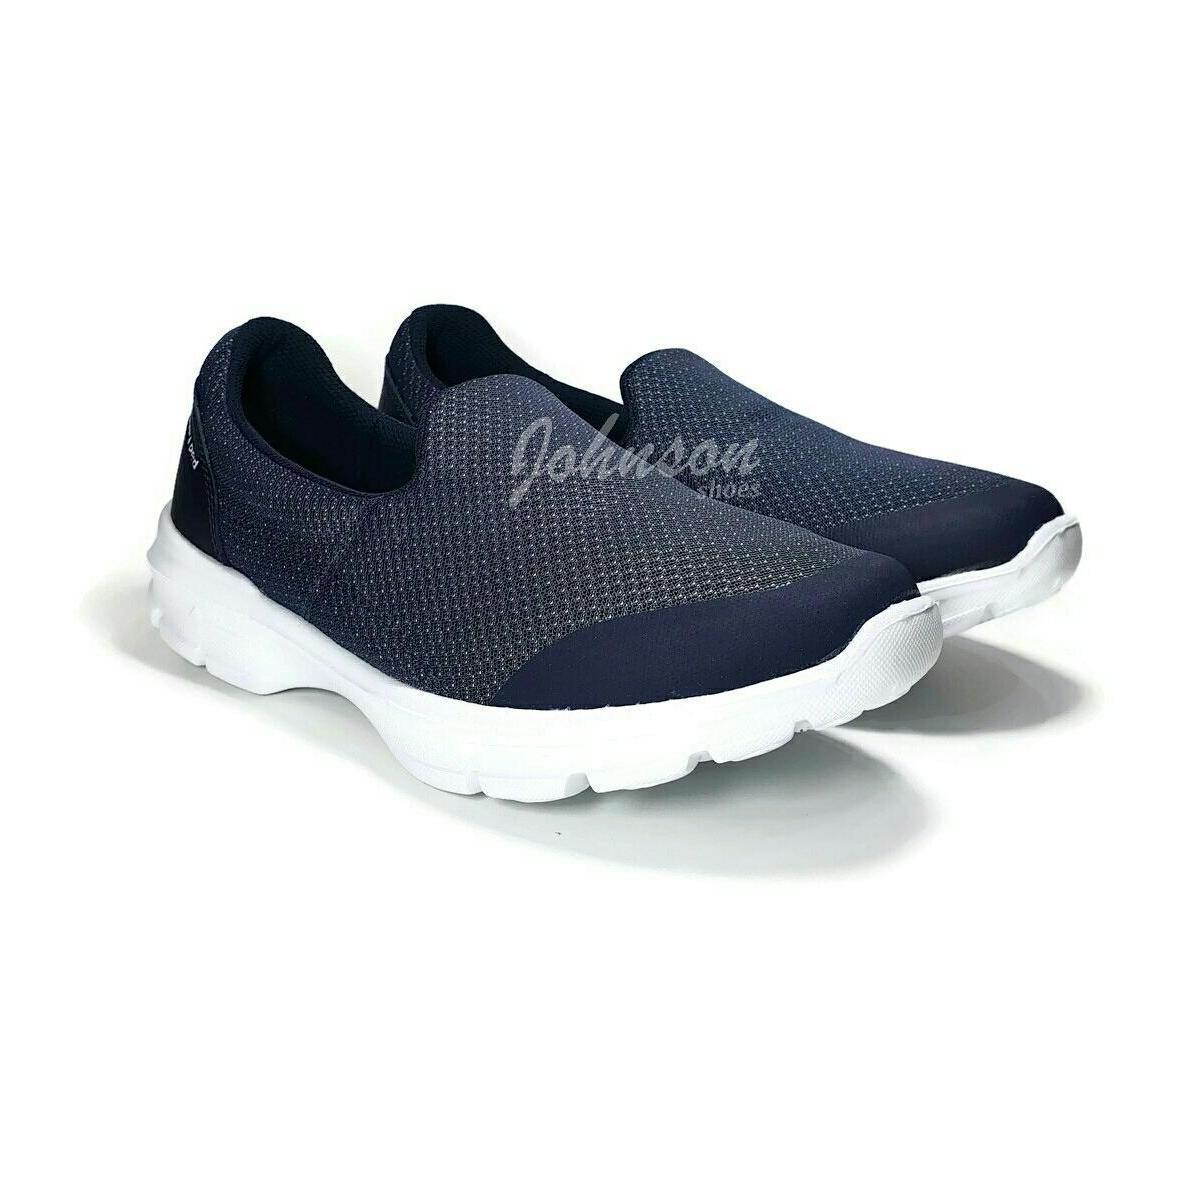 Johnson Shoes   Sepatu Wanita HOMYPED - RANIA Hitam dan Biru 62d30f8183